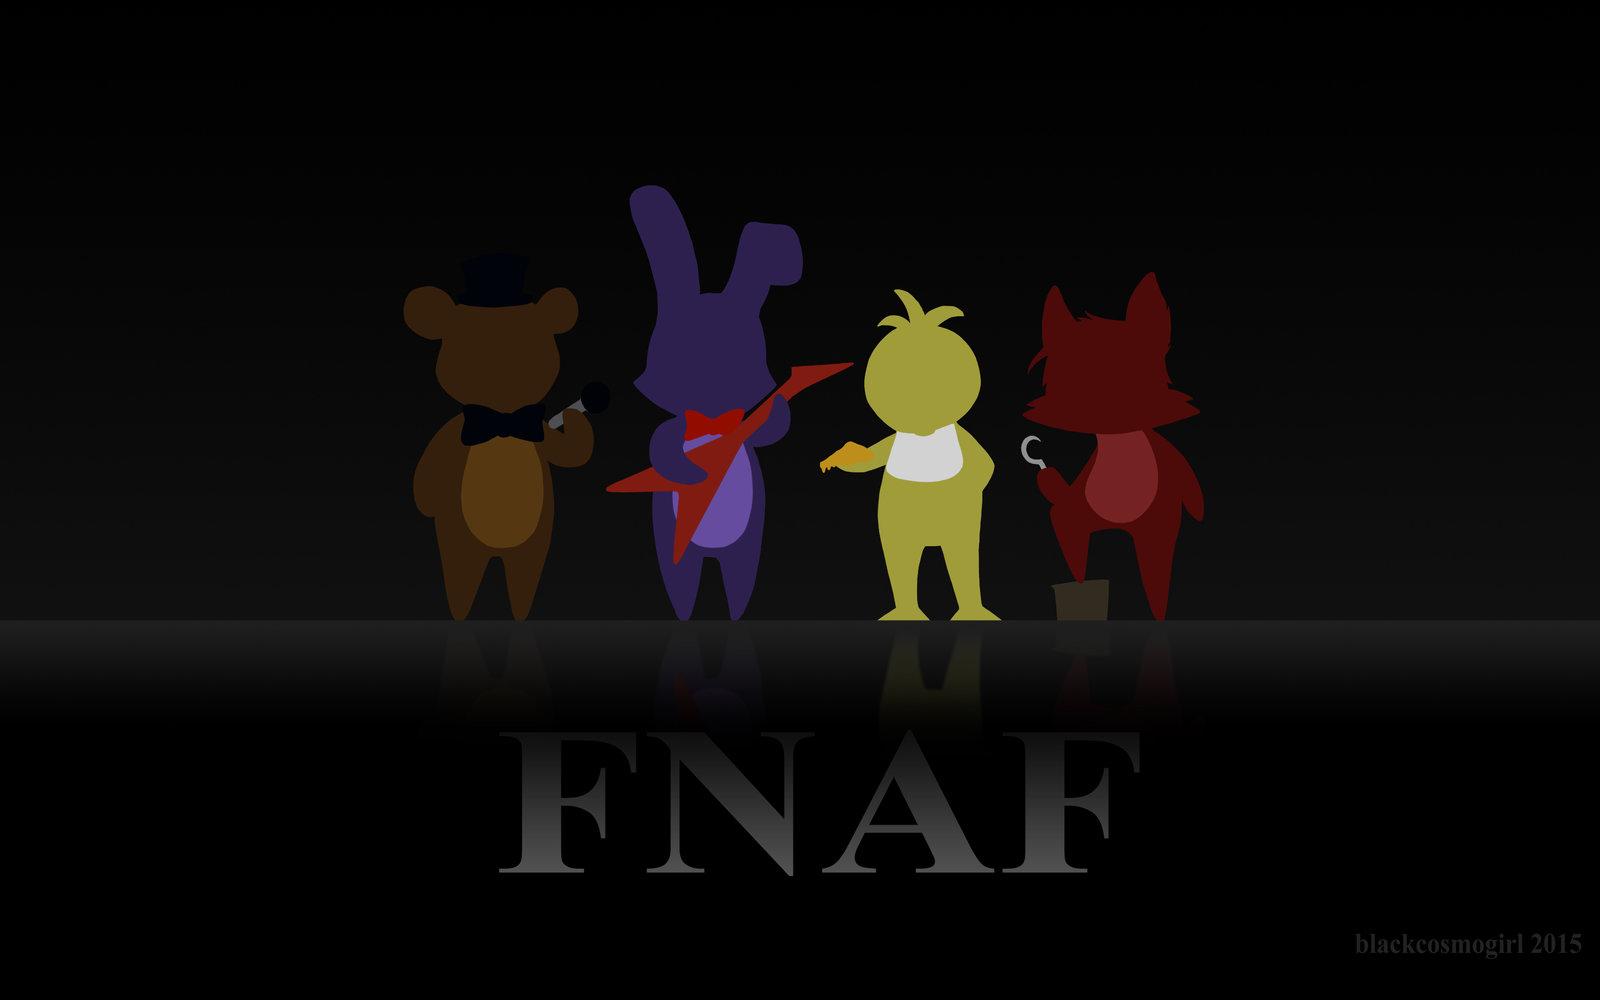 FNAF wallpaper 1680 x 1050 by blackcosmogirl 1600x1000